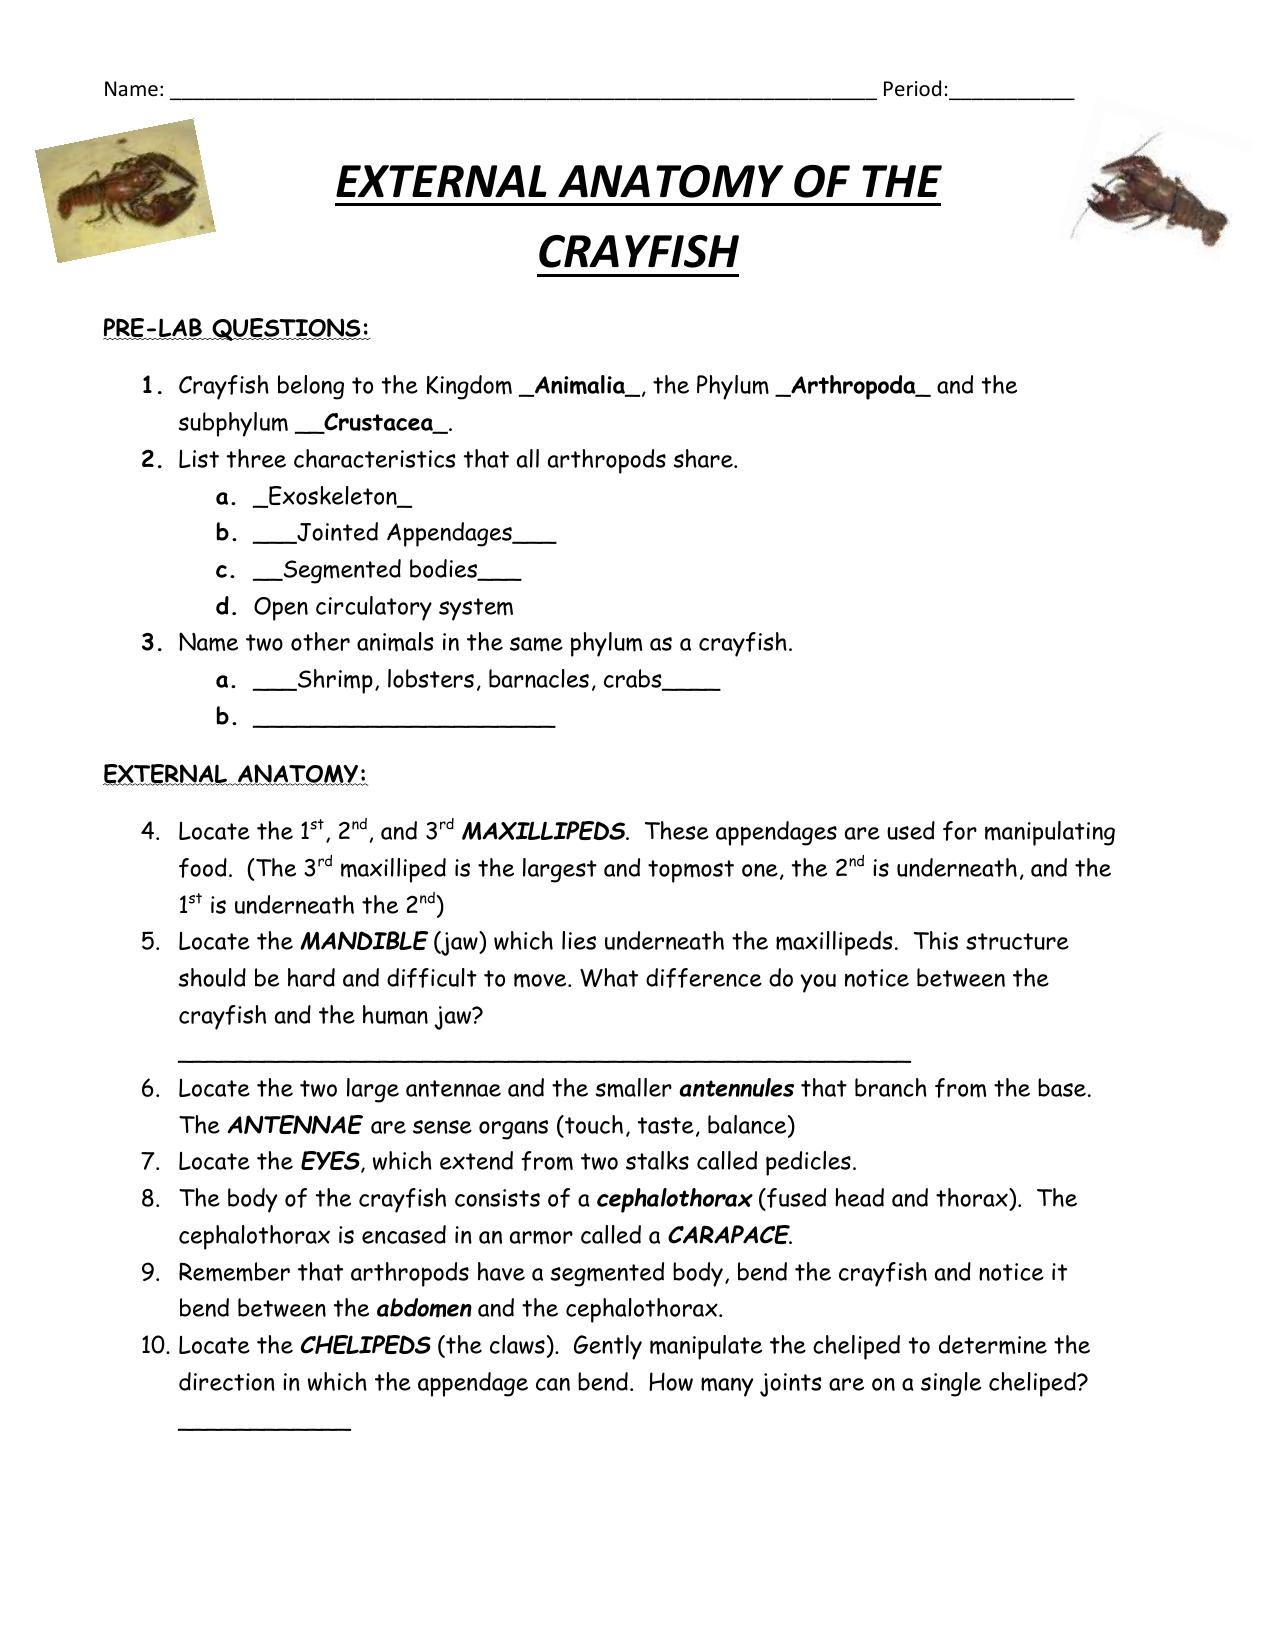 Name Period External Anatomy Of The Crayfish